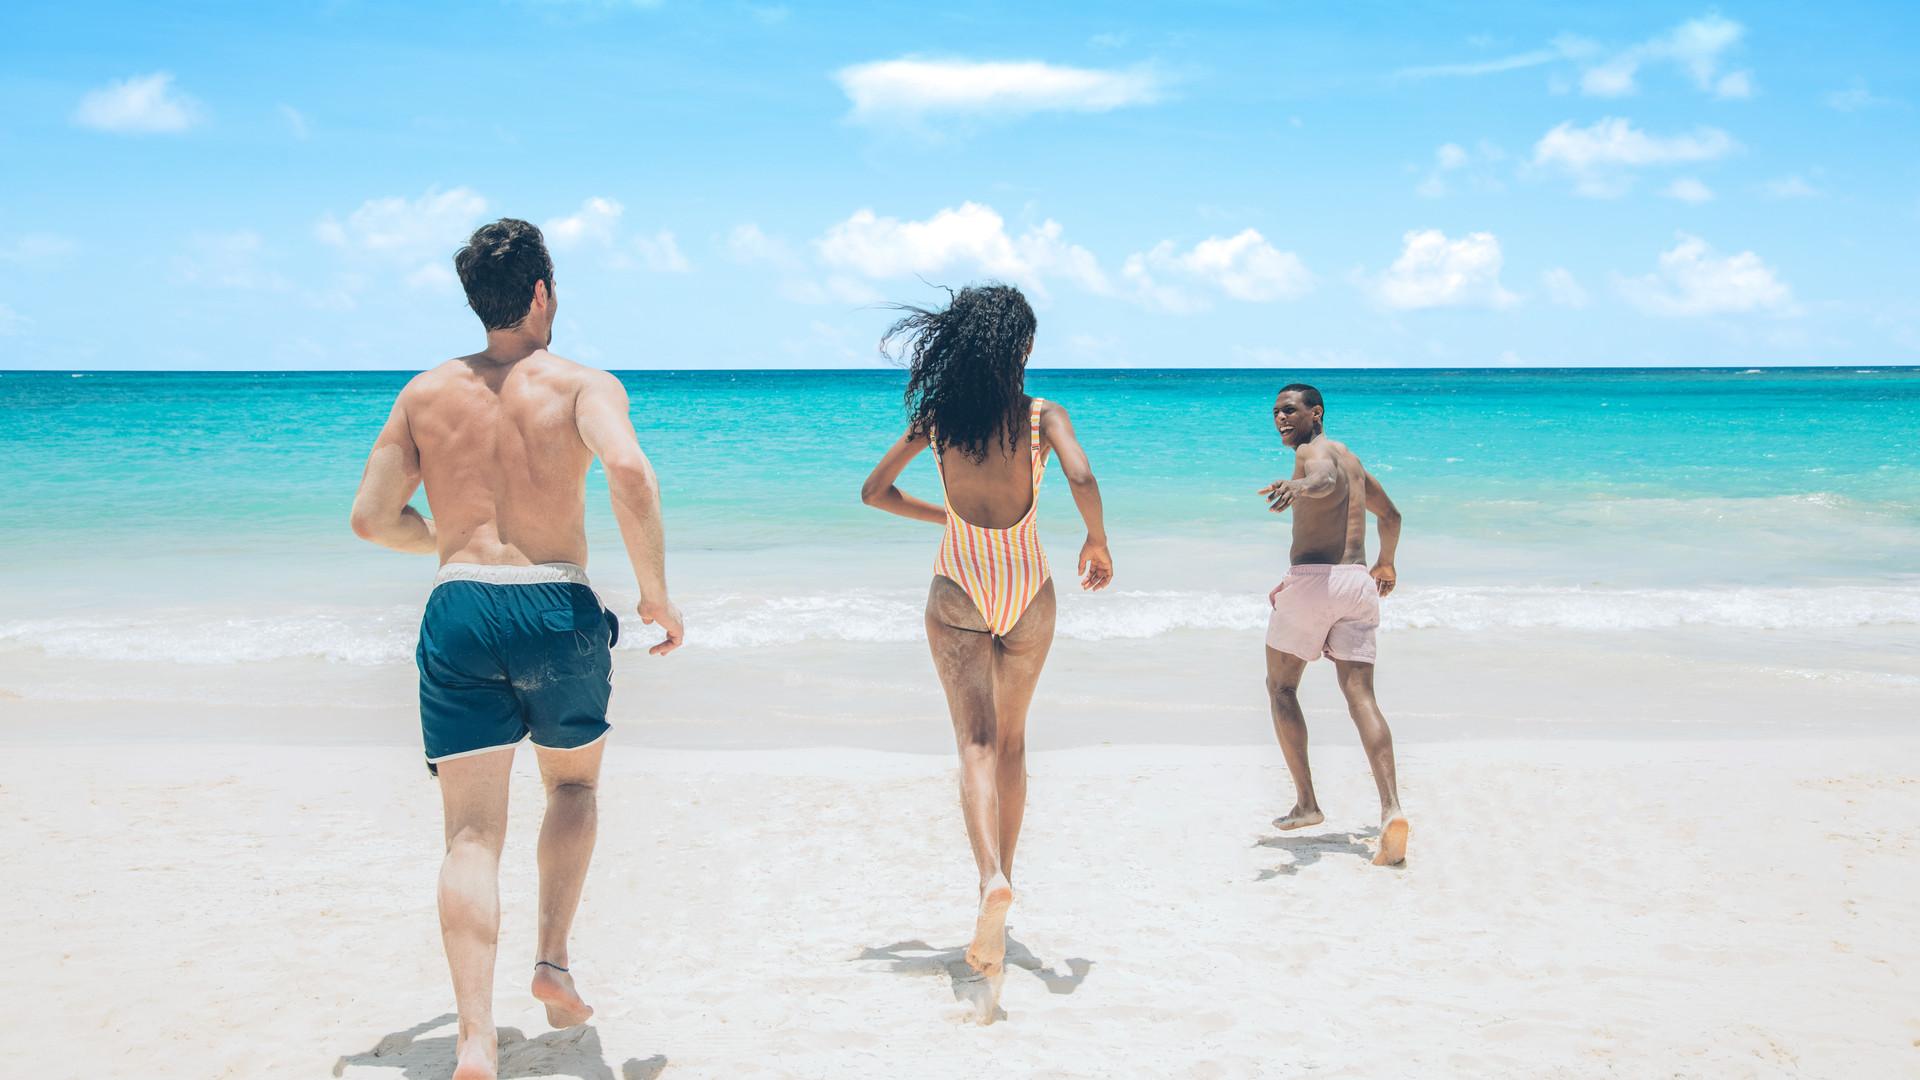 Jamaica - May 2020